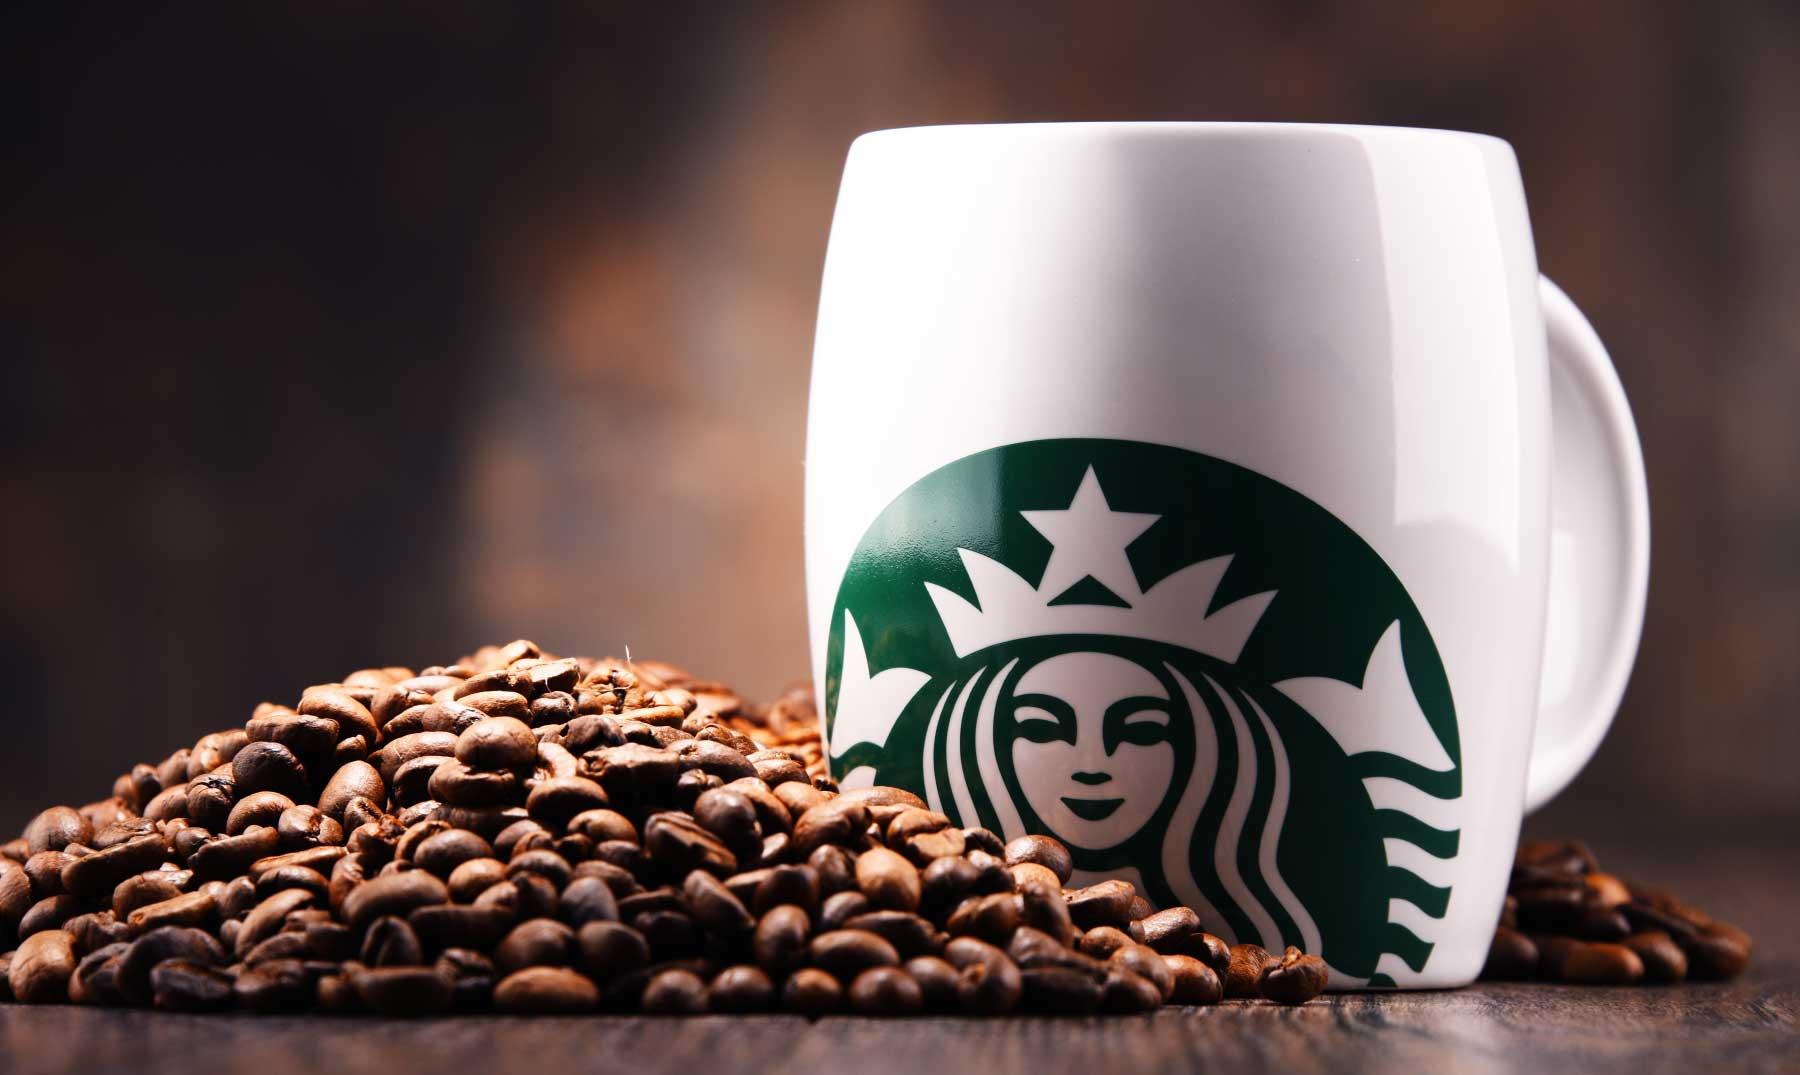 granos de café y taza con logo-franquicia-starbucks